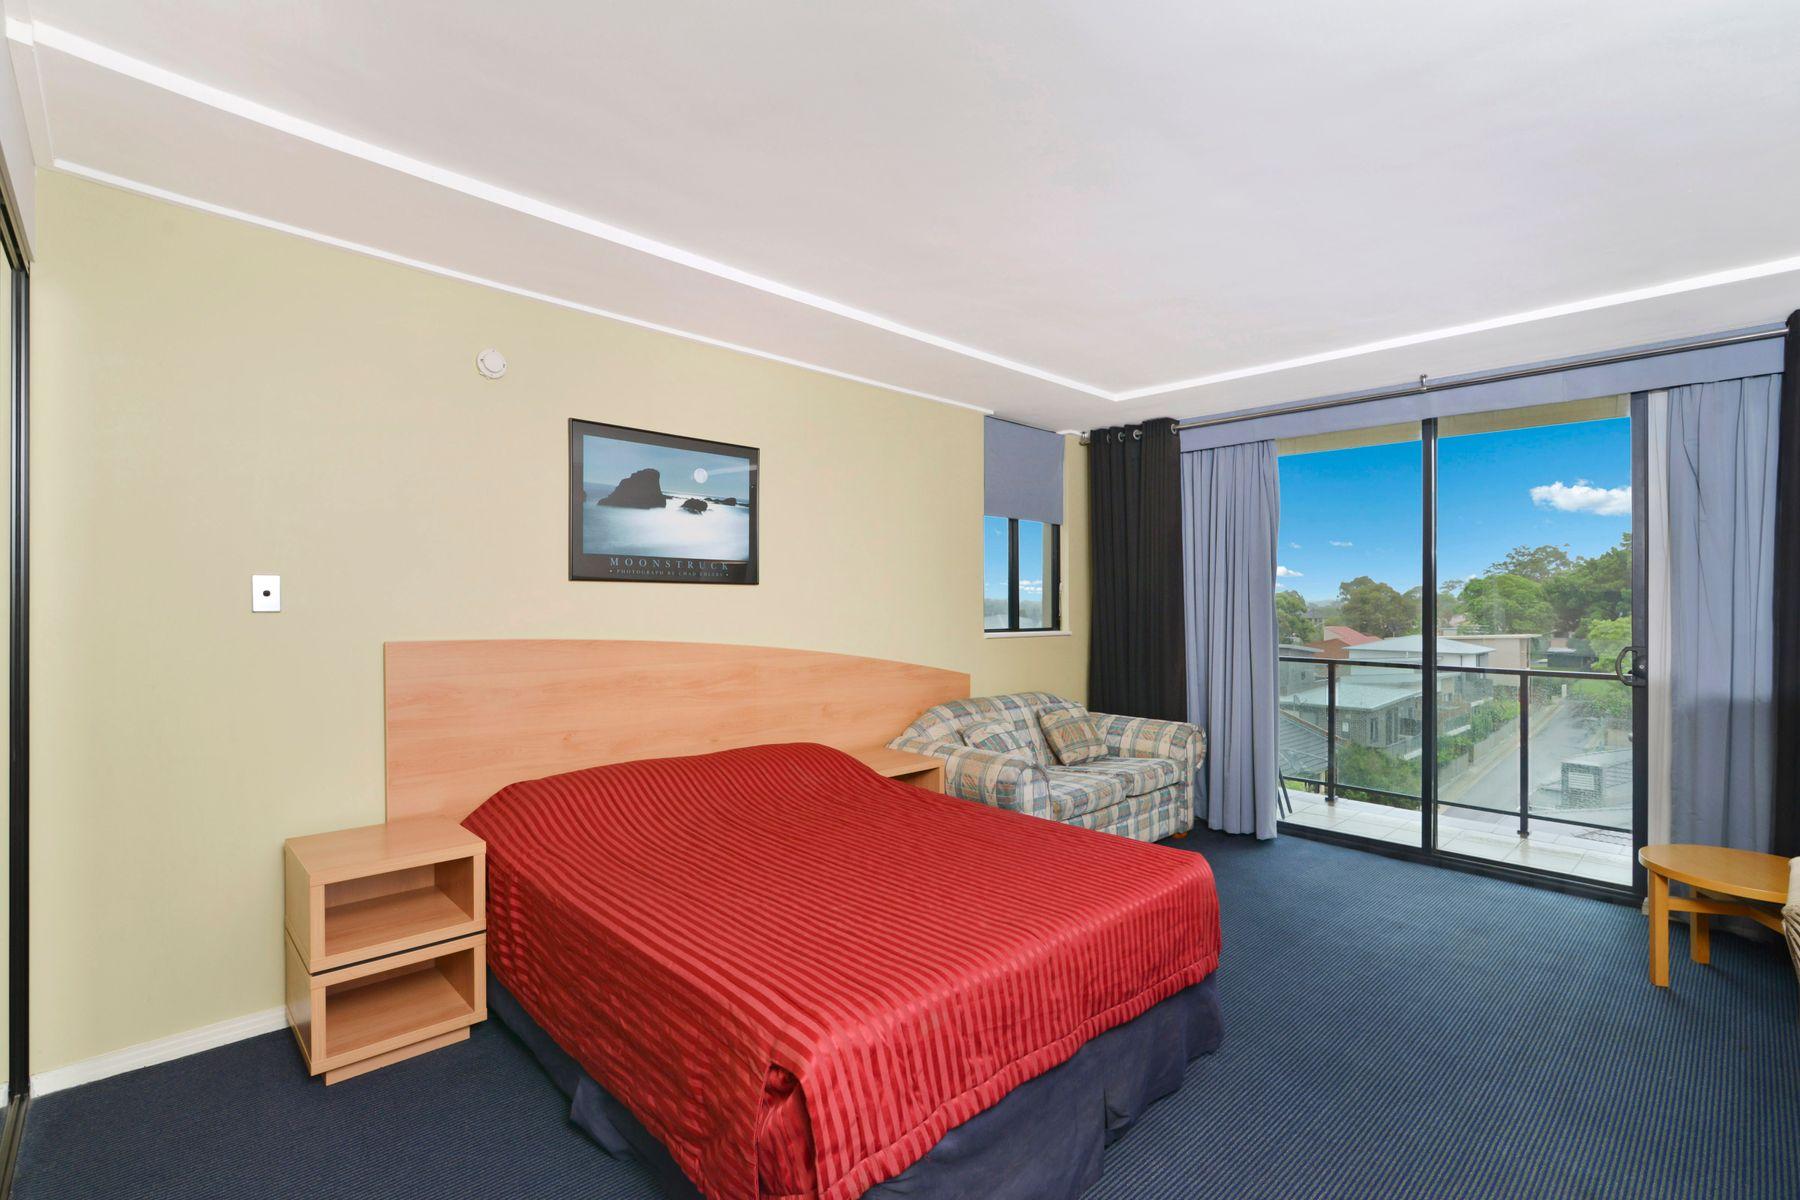 302/110-114 James Ruse Drive, Rosehill, NSW 2142